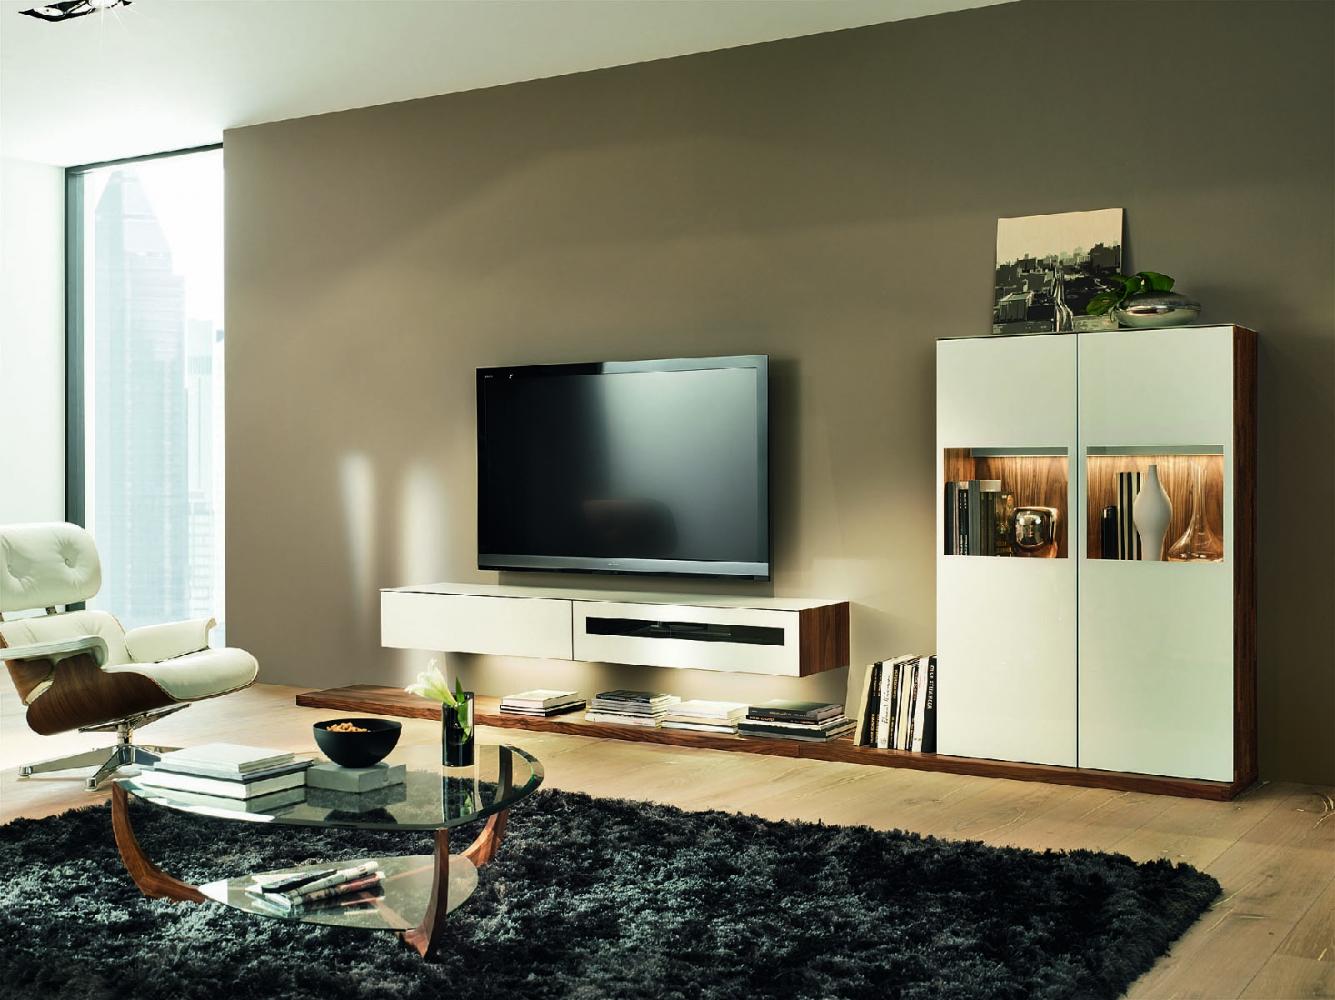 neutr ln lad n nap cel m interi rem. Black Bedroom Furniture Sets. Home Design Ideas